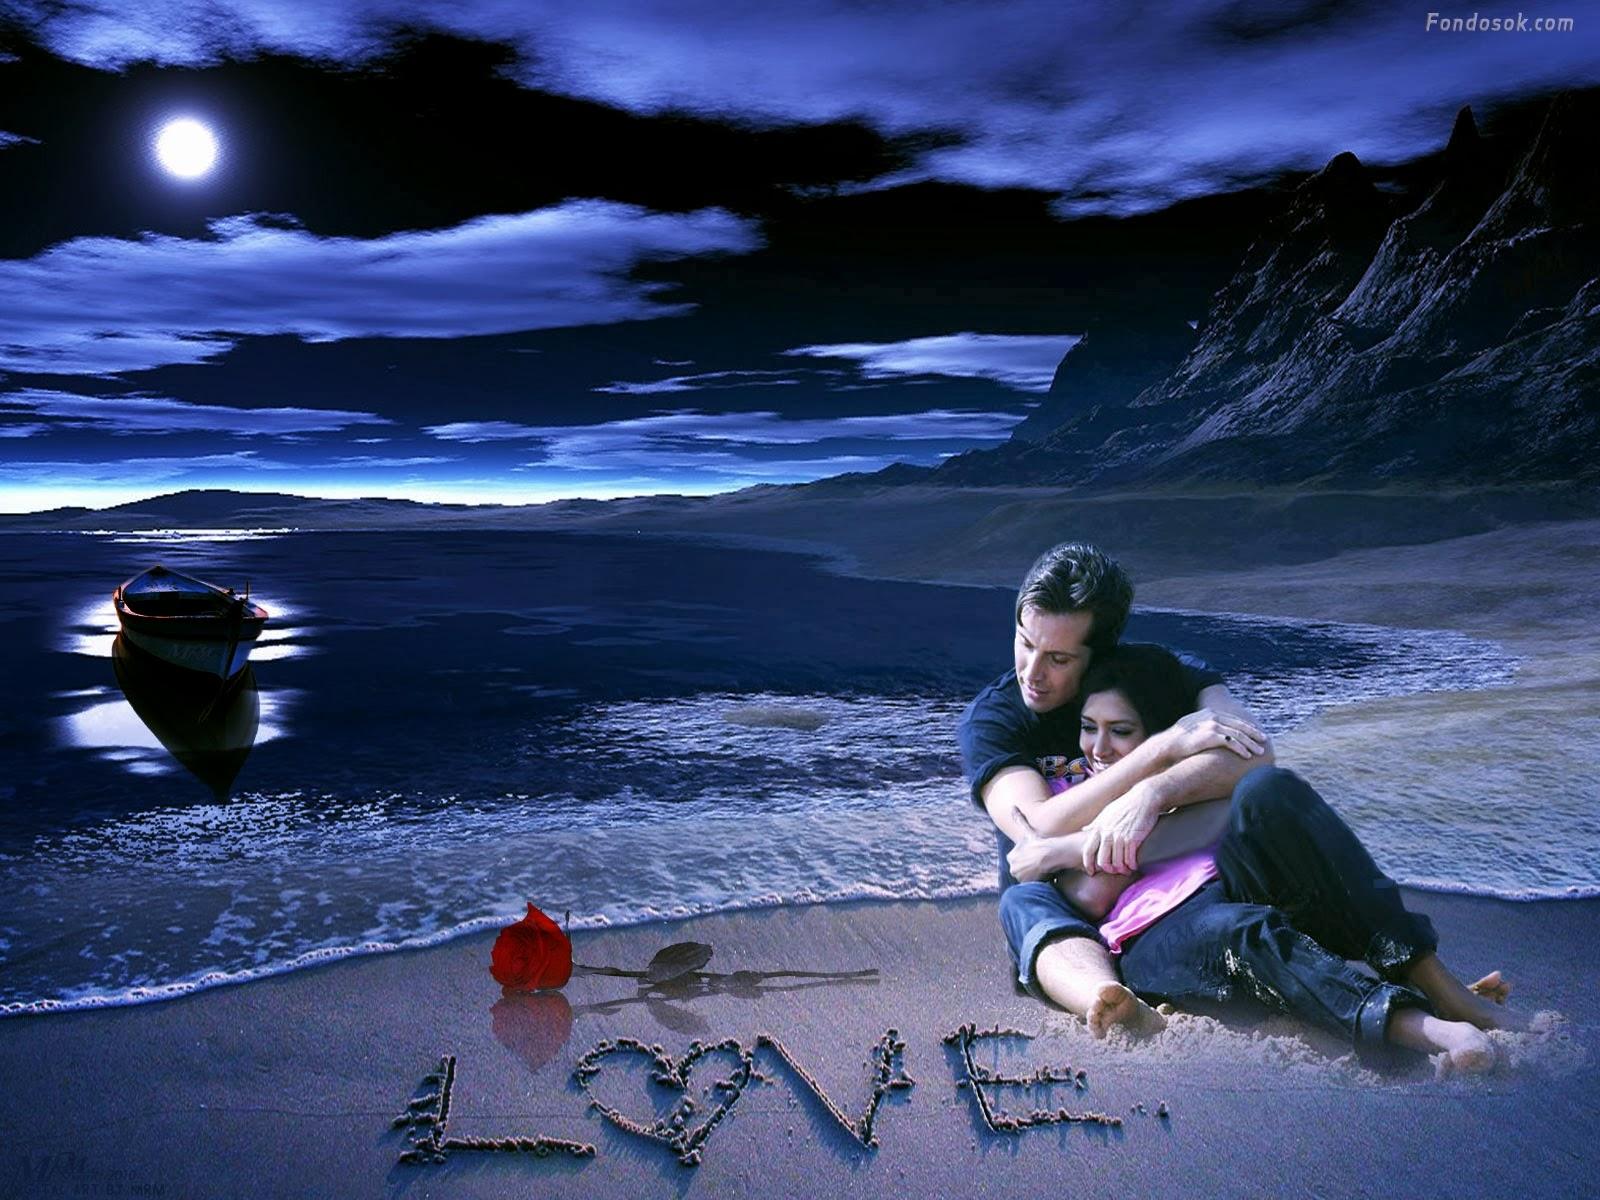 paisaje de amor en la playa